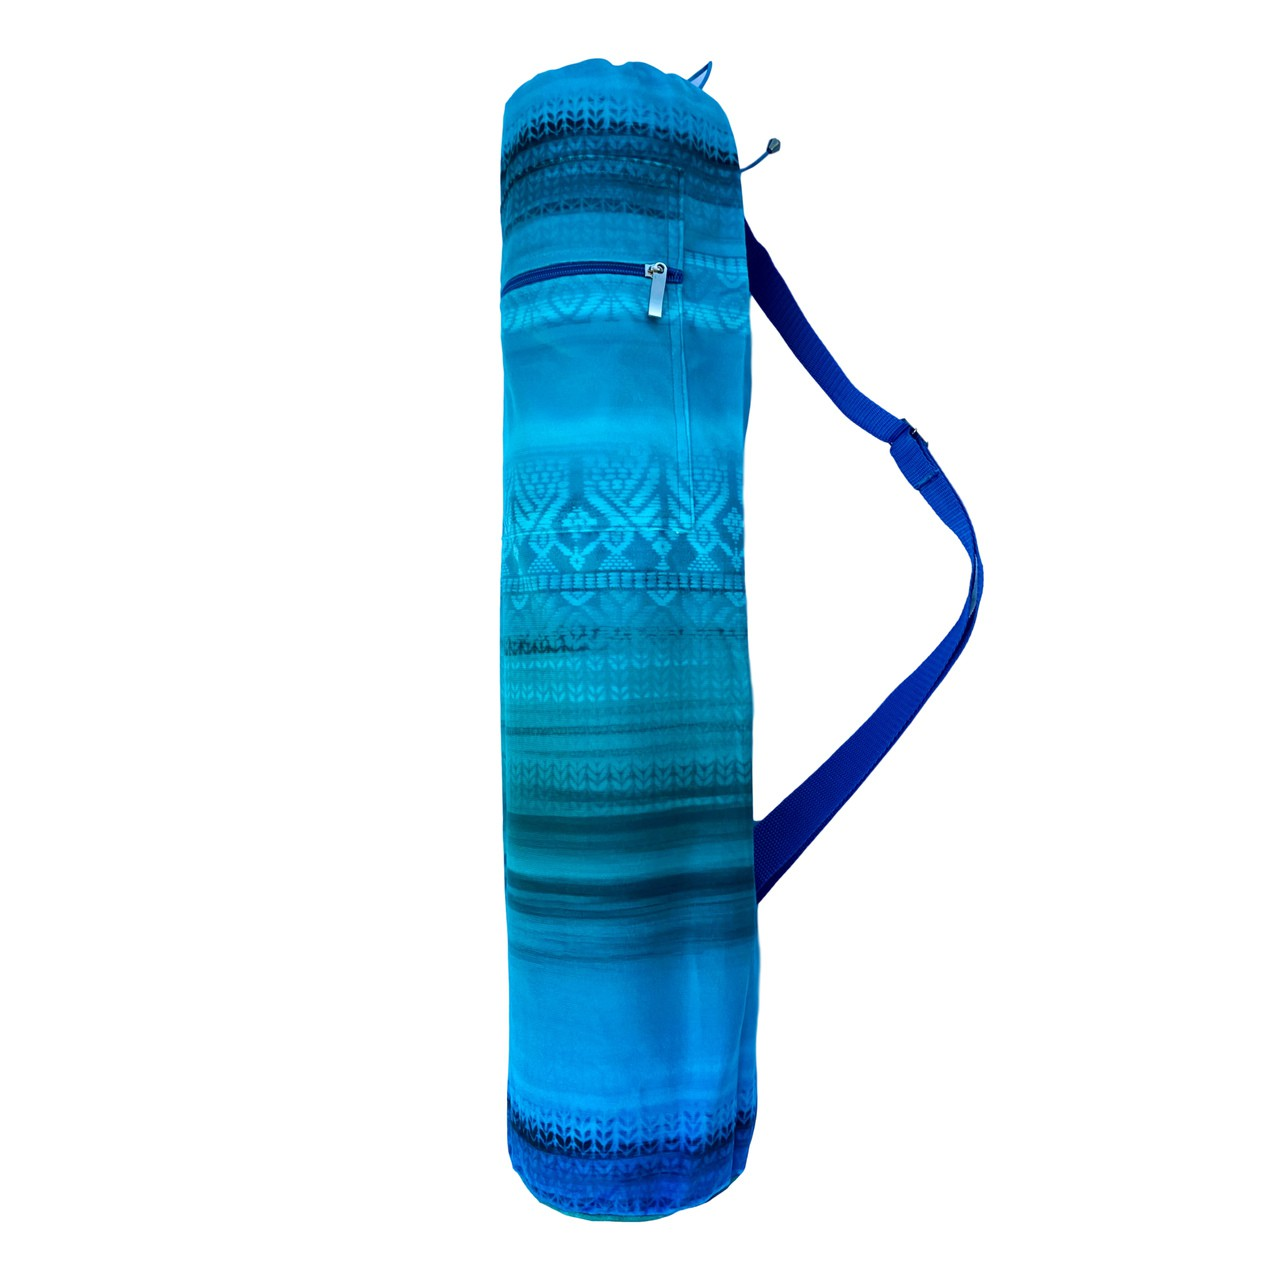 Bolsa Porta Tapete / Mat Gili - Acqua e Azul